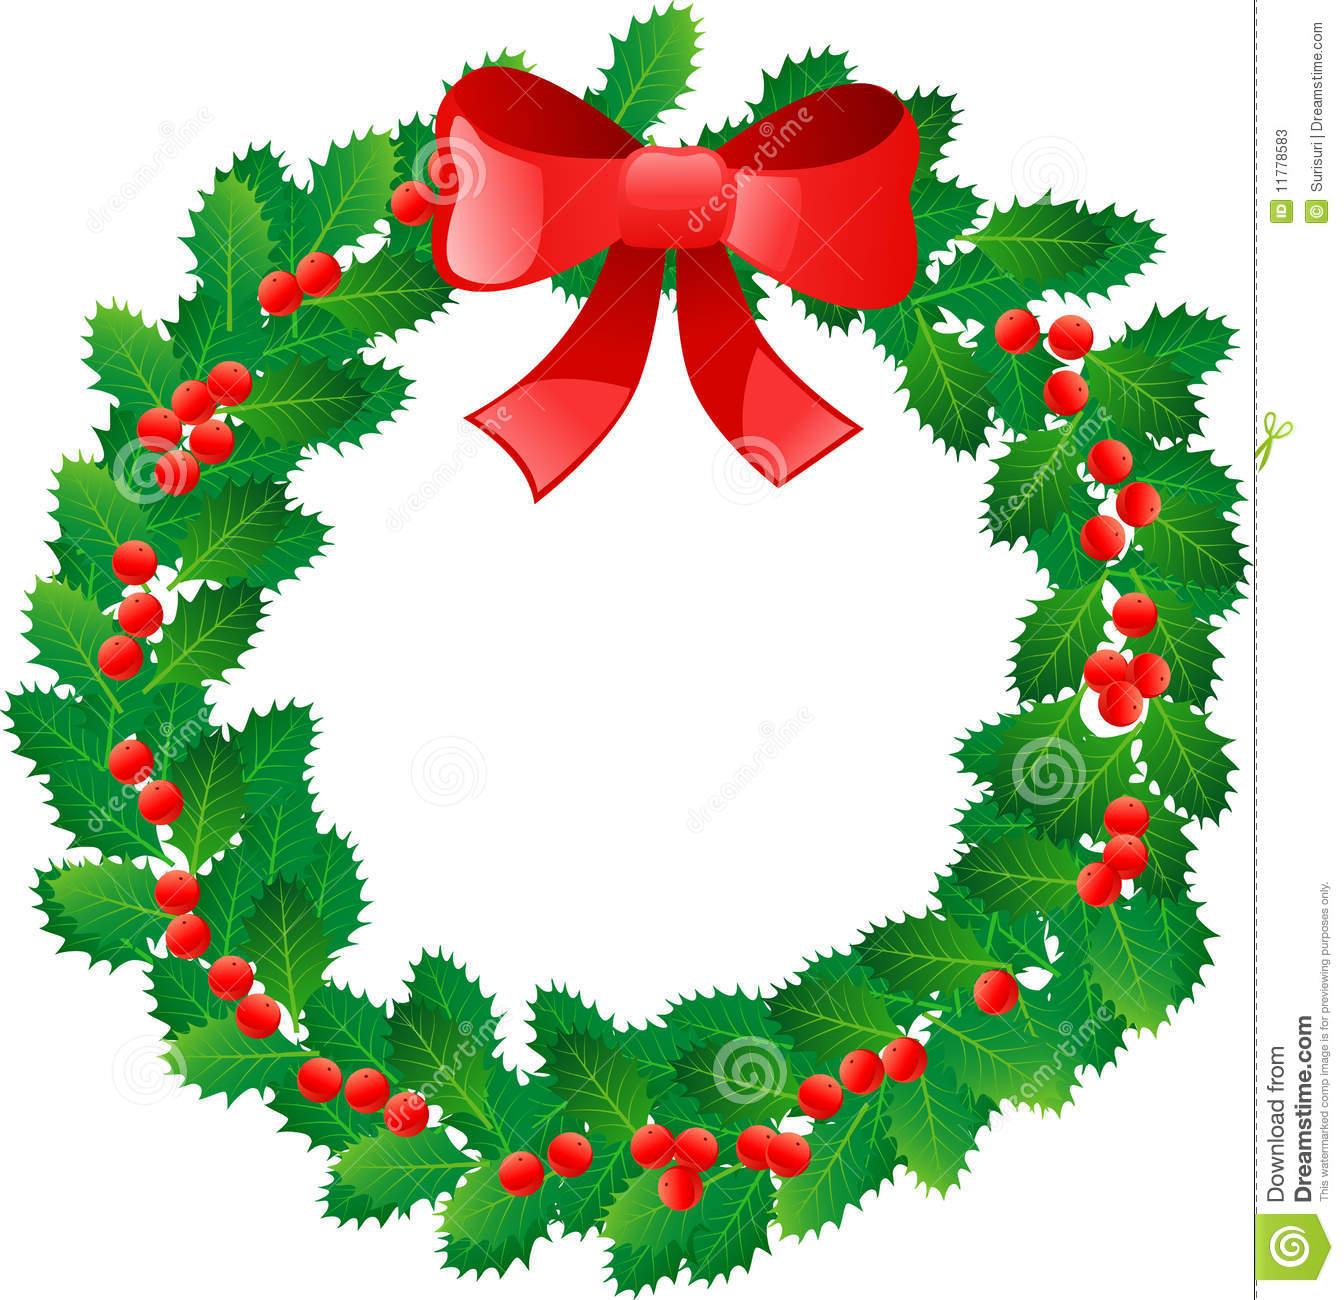 Christmas Wreath Border Clipart Clipart Suggest